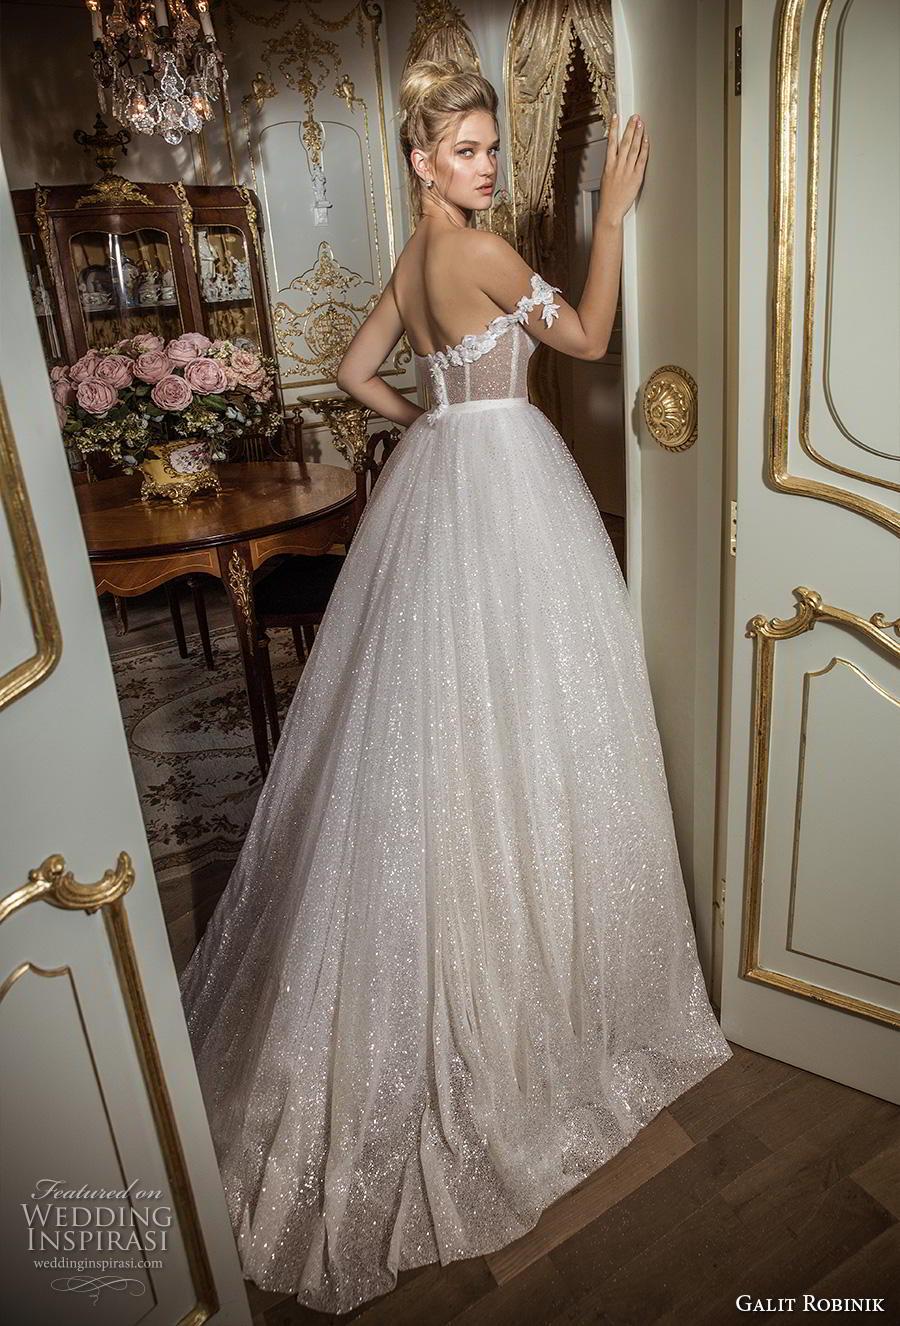 galit robinik 2019 bridal one shoulder sweetheart neckline full embellishment bustier glitzy romantic ball gown a  line wedding dress mid back chapel train (6) bv